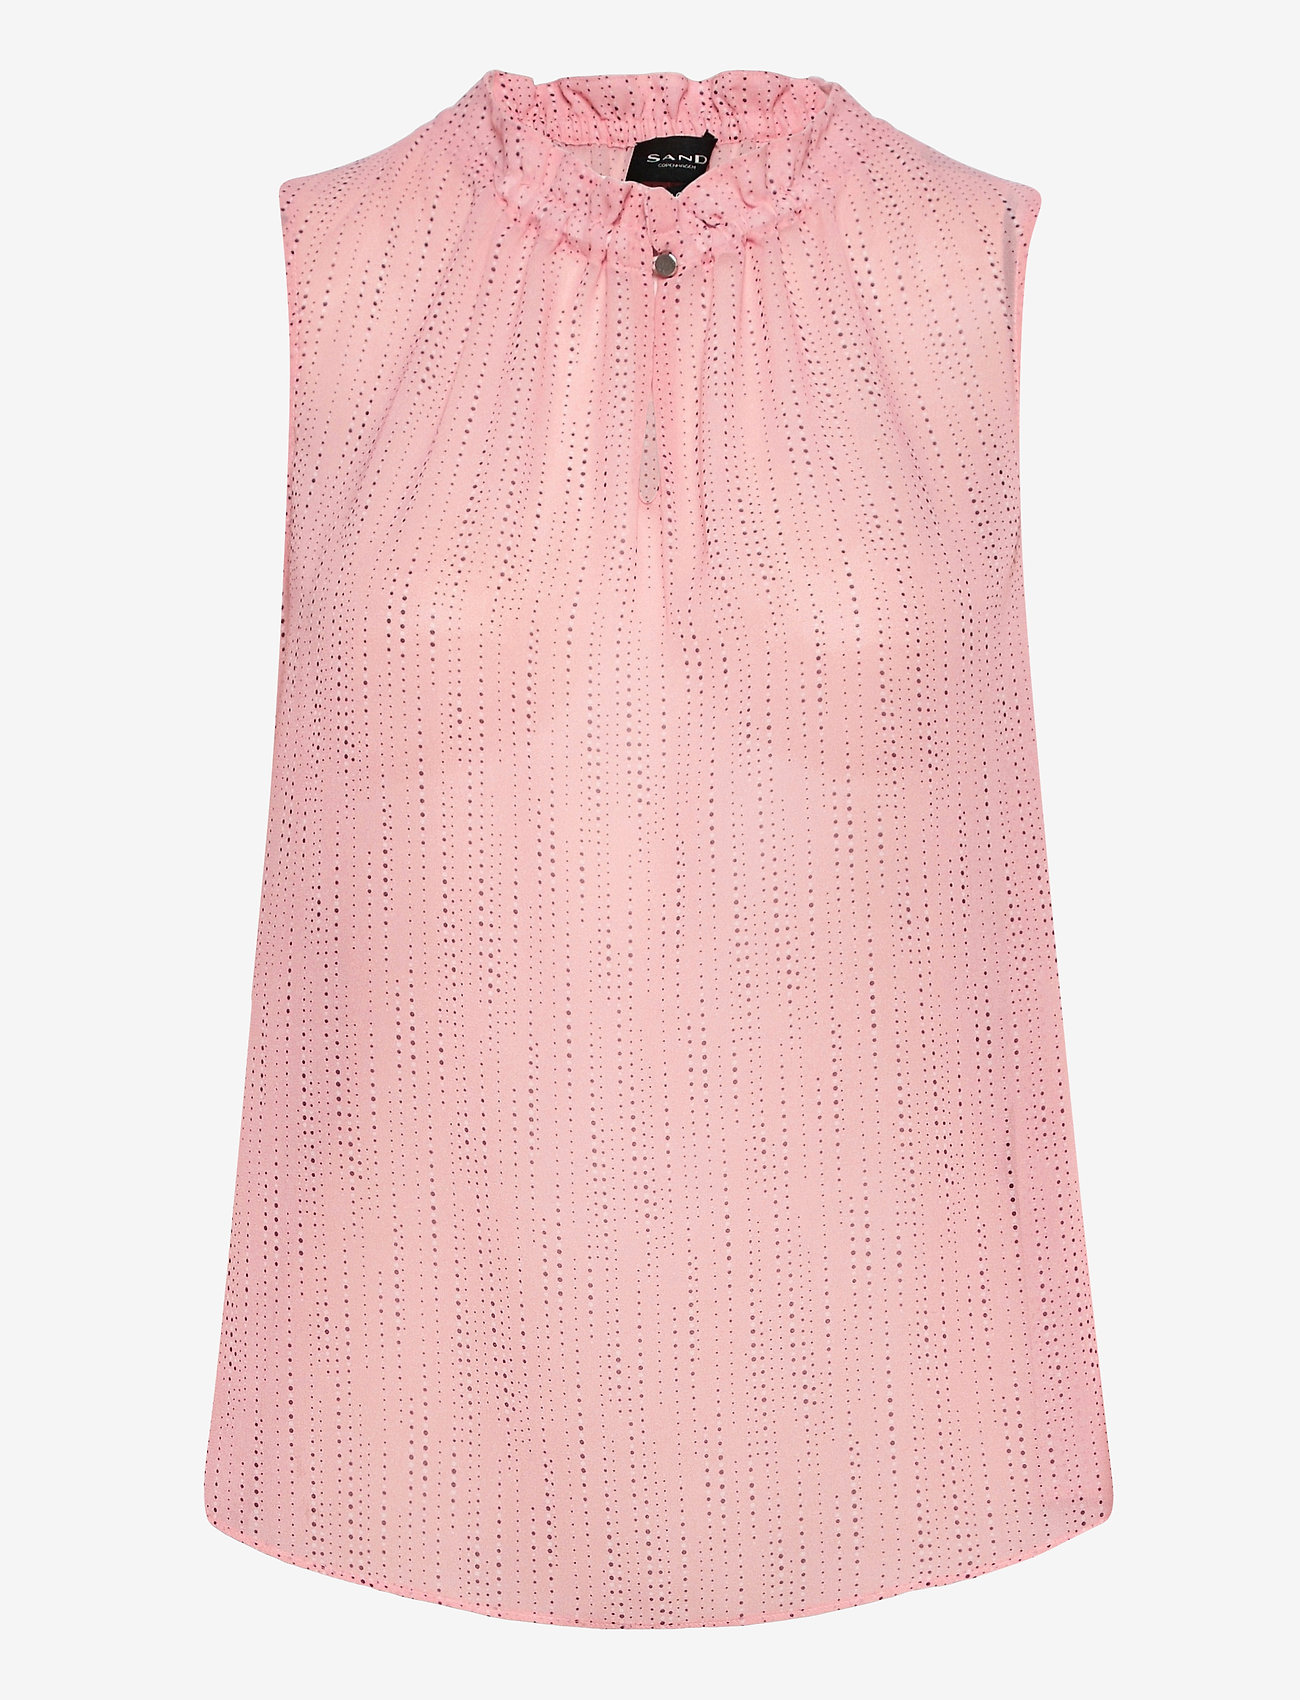 SAND - 3438 - Raya F - blouses zonder mouwen - soft pink - 0